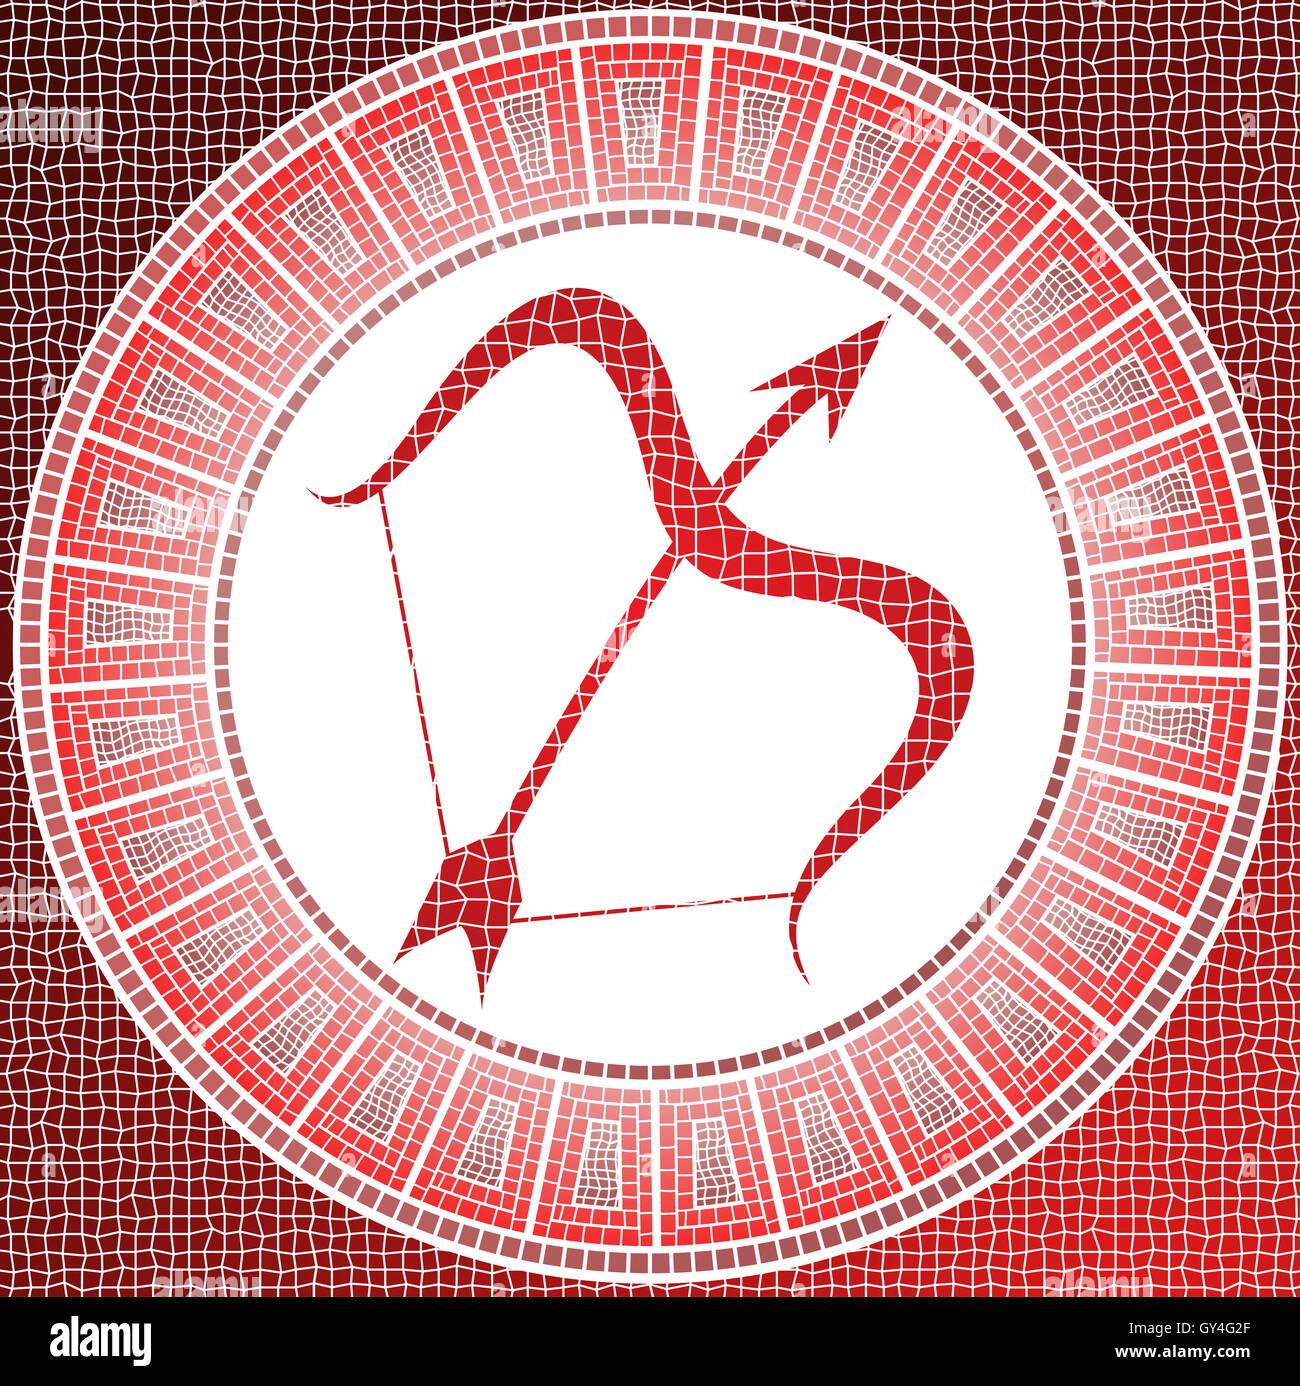 Element fire sagittarius zodiac sign on a mosaic stock photo element fire sagittarius zodiac sign on a mosaic biocorpaavc